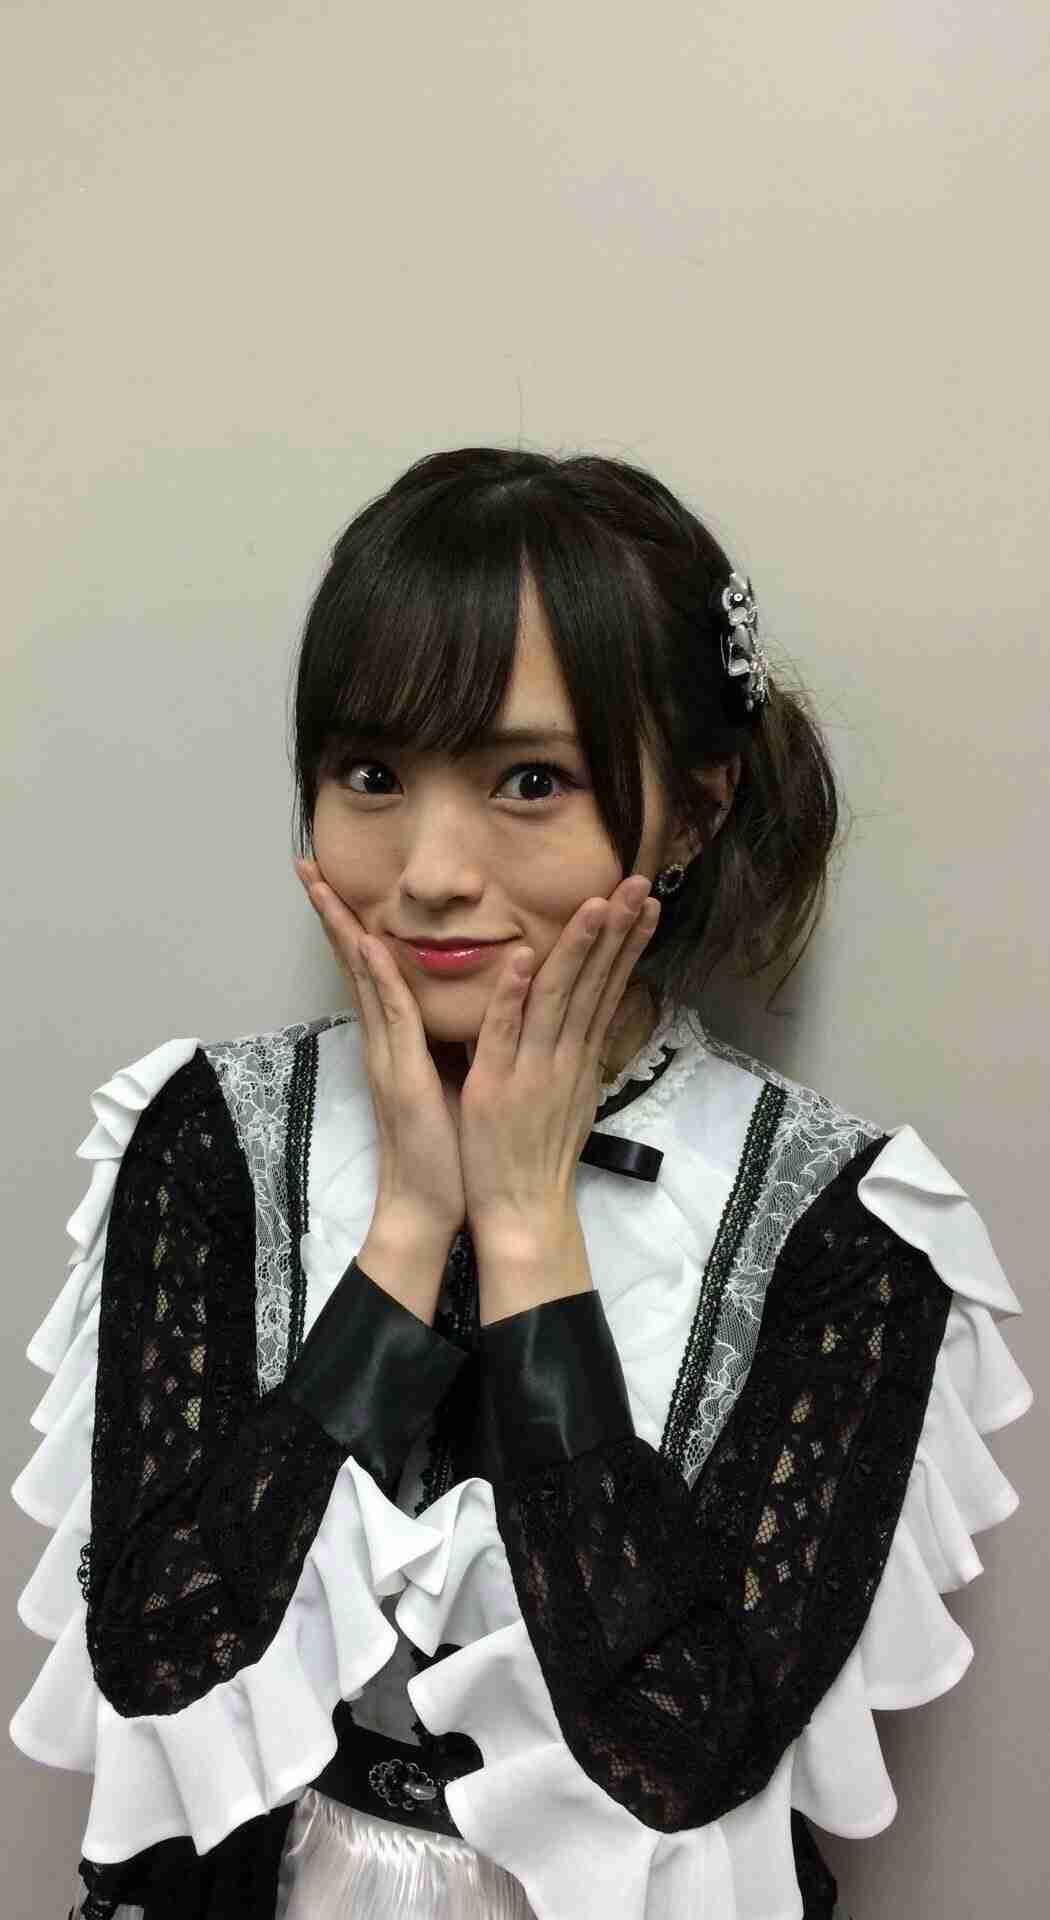 NMB48山本彩、ミニスカートで色白美脚披露「スタイル良い」と絶賛の声